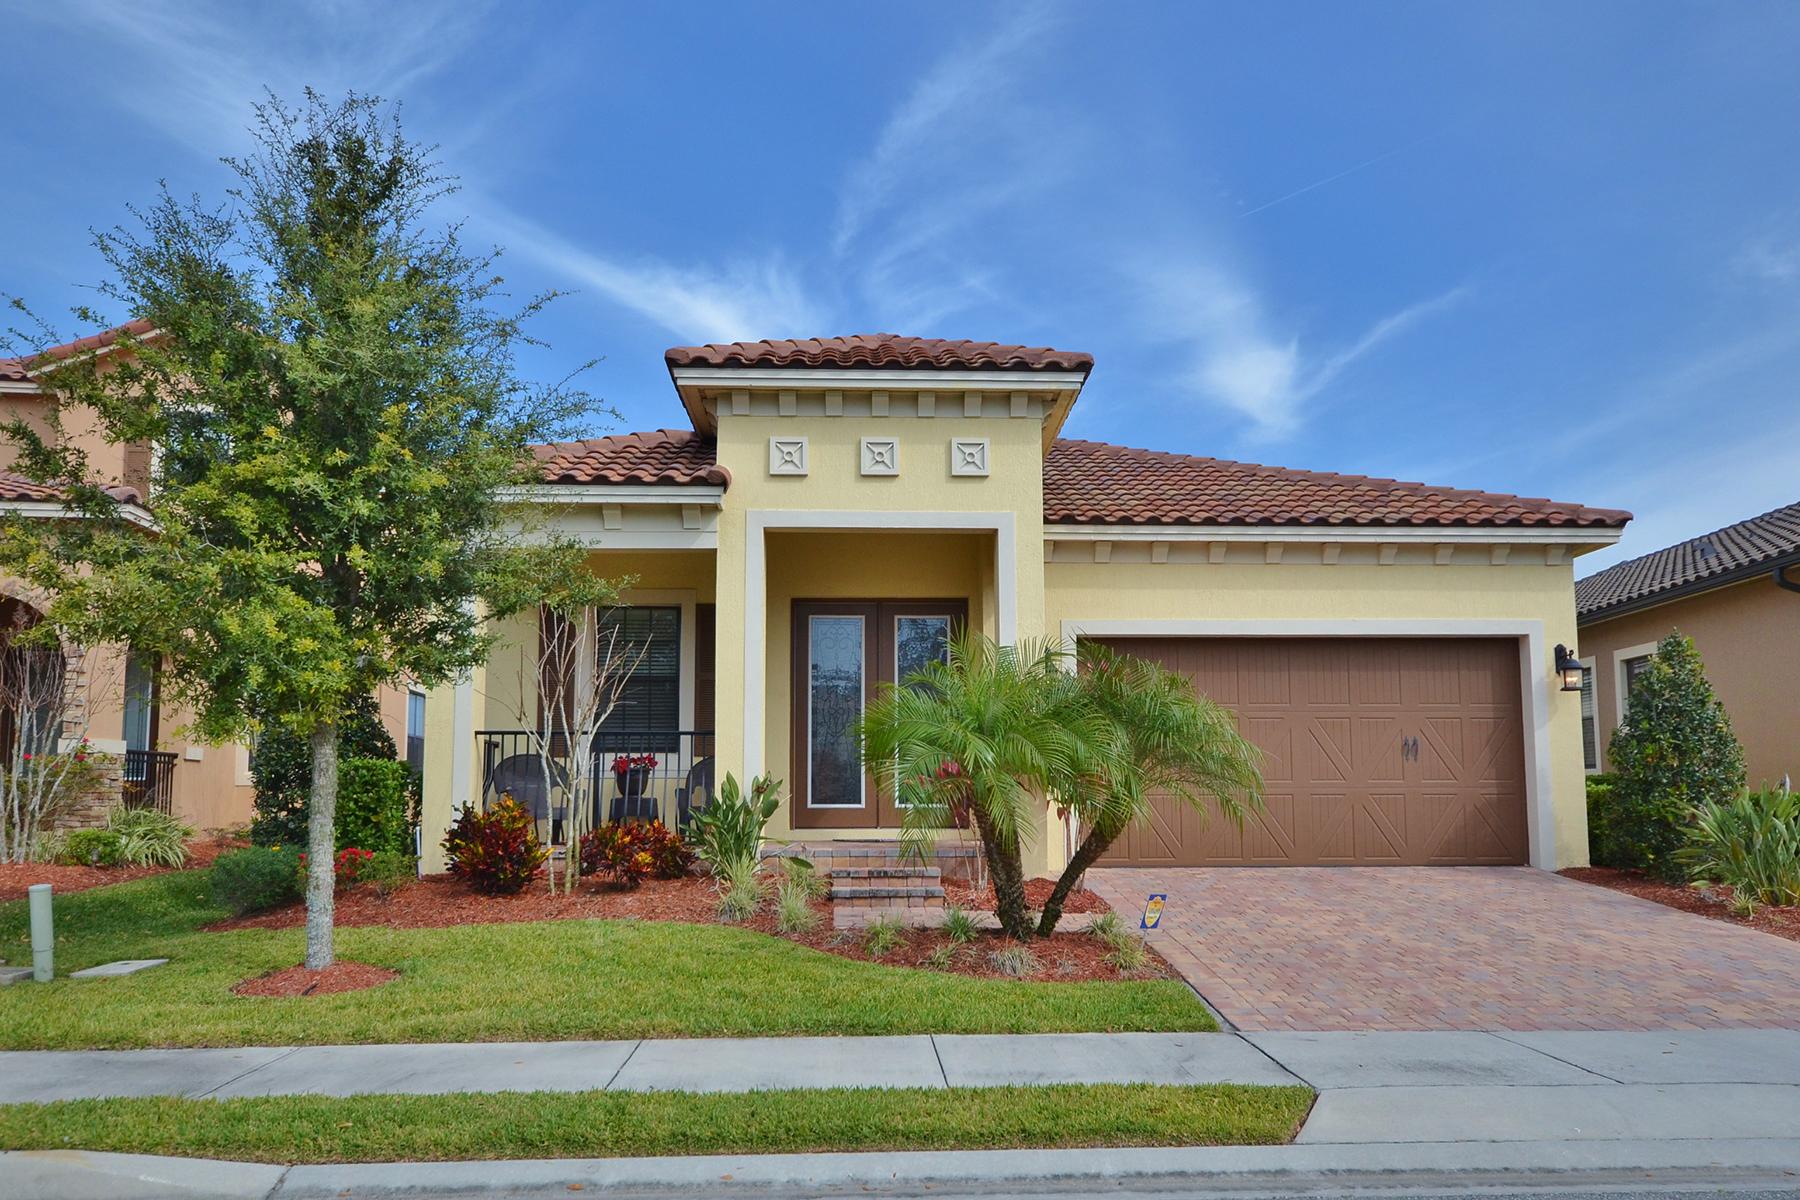 Single Family Home for Sale at ORLANDO 10443 Henbury St Orlando, Florida, 32832 United States